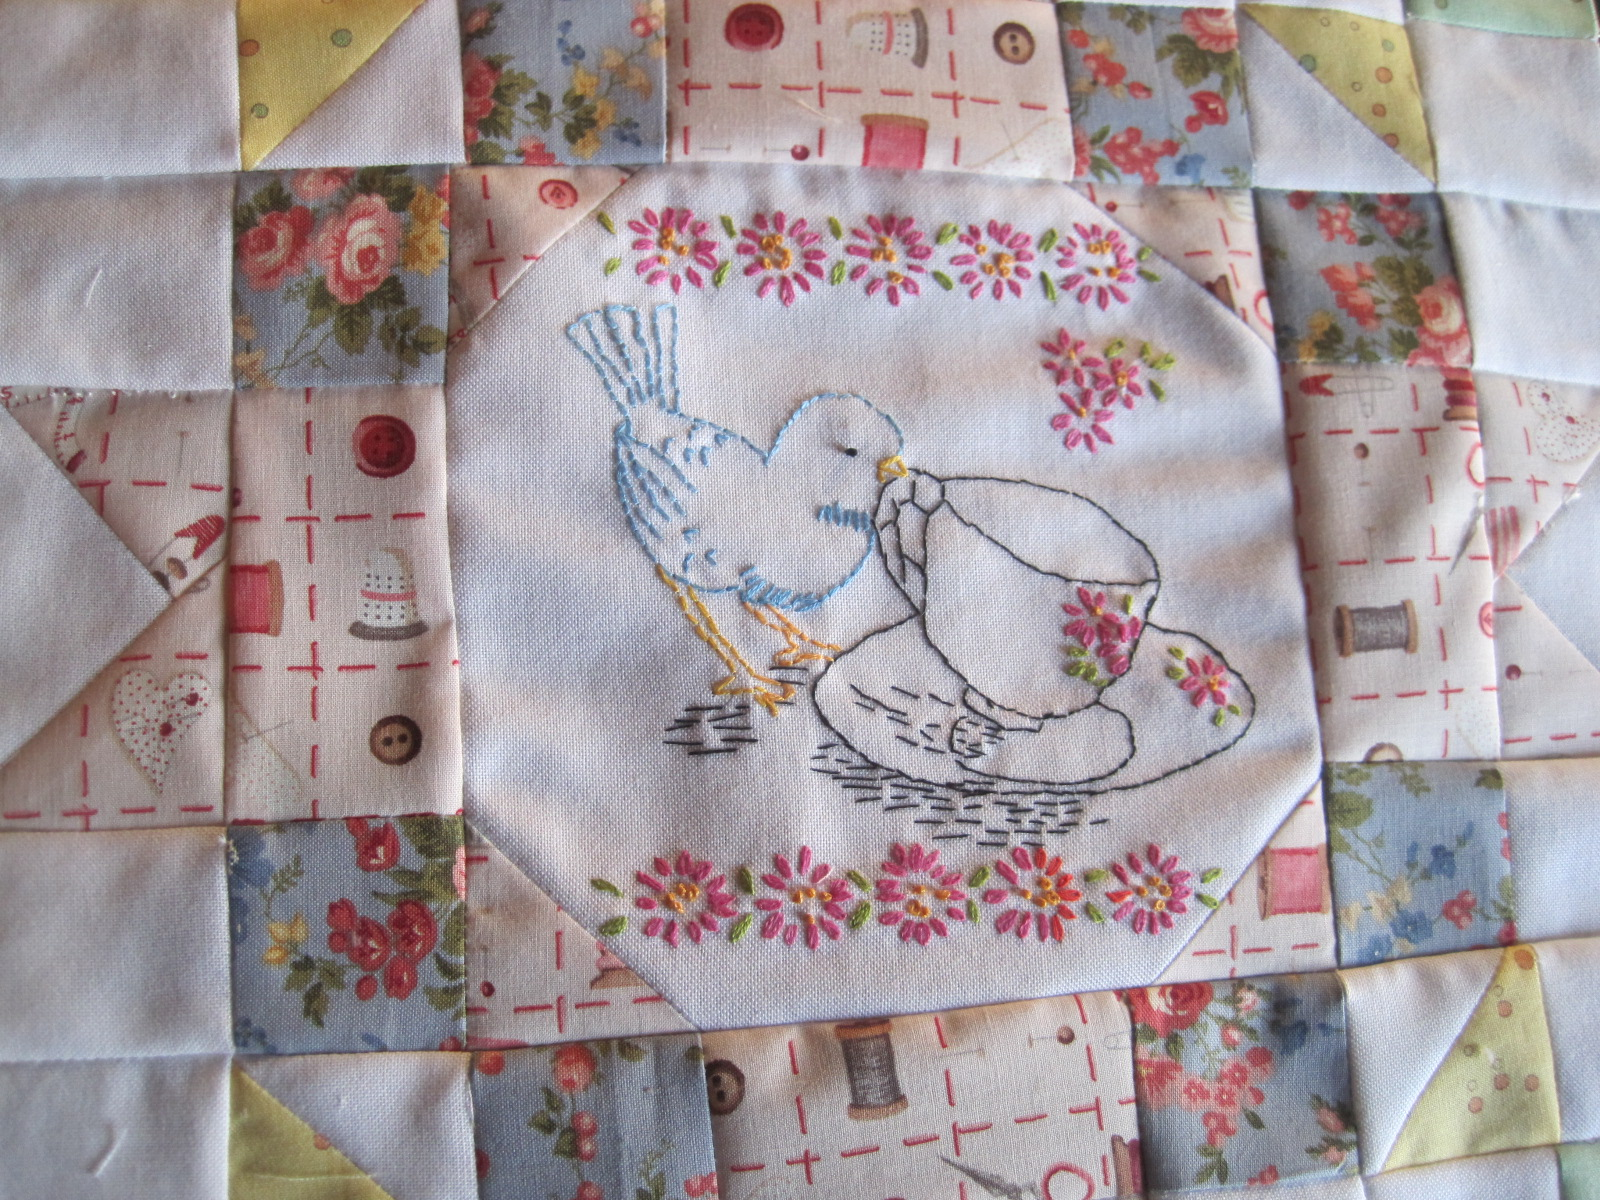 Vintage Winter Christmas Scenes Quilt Blocks Embroidered NICE #2 SET